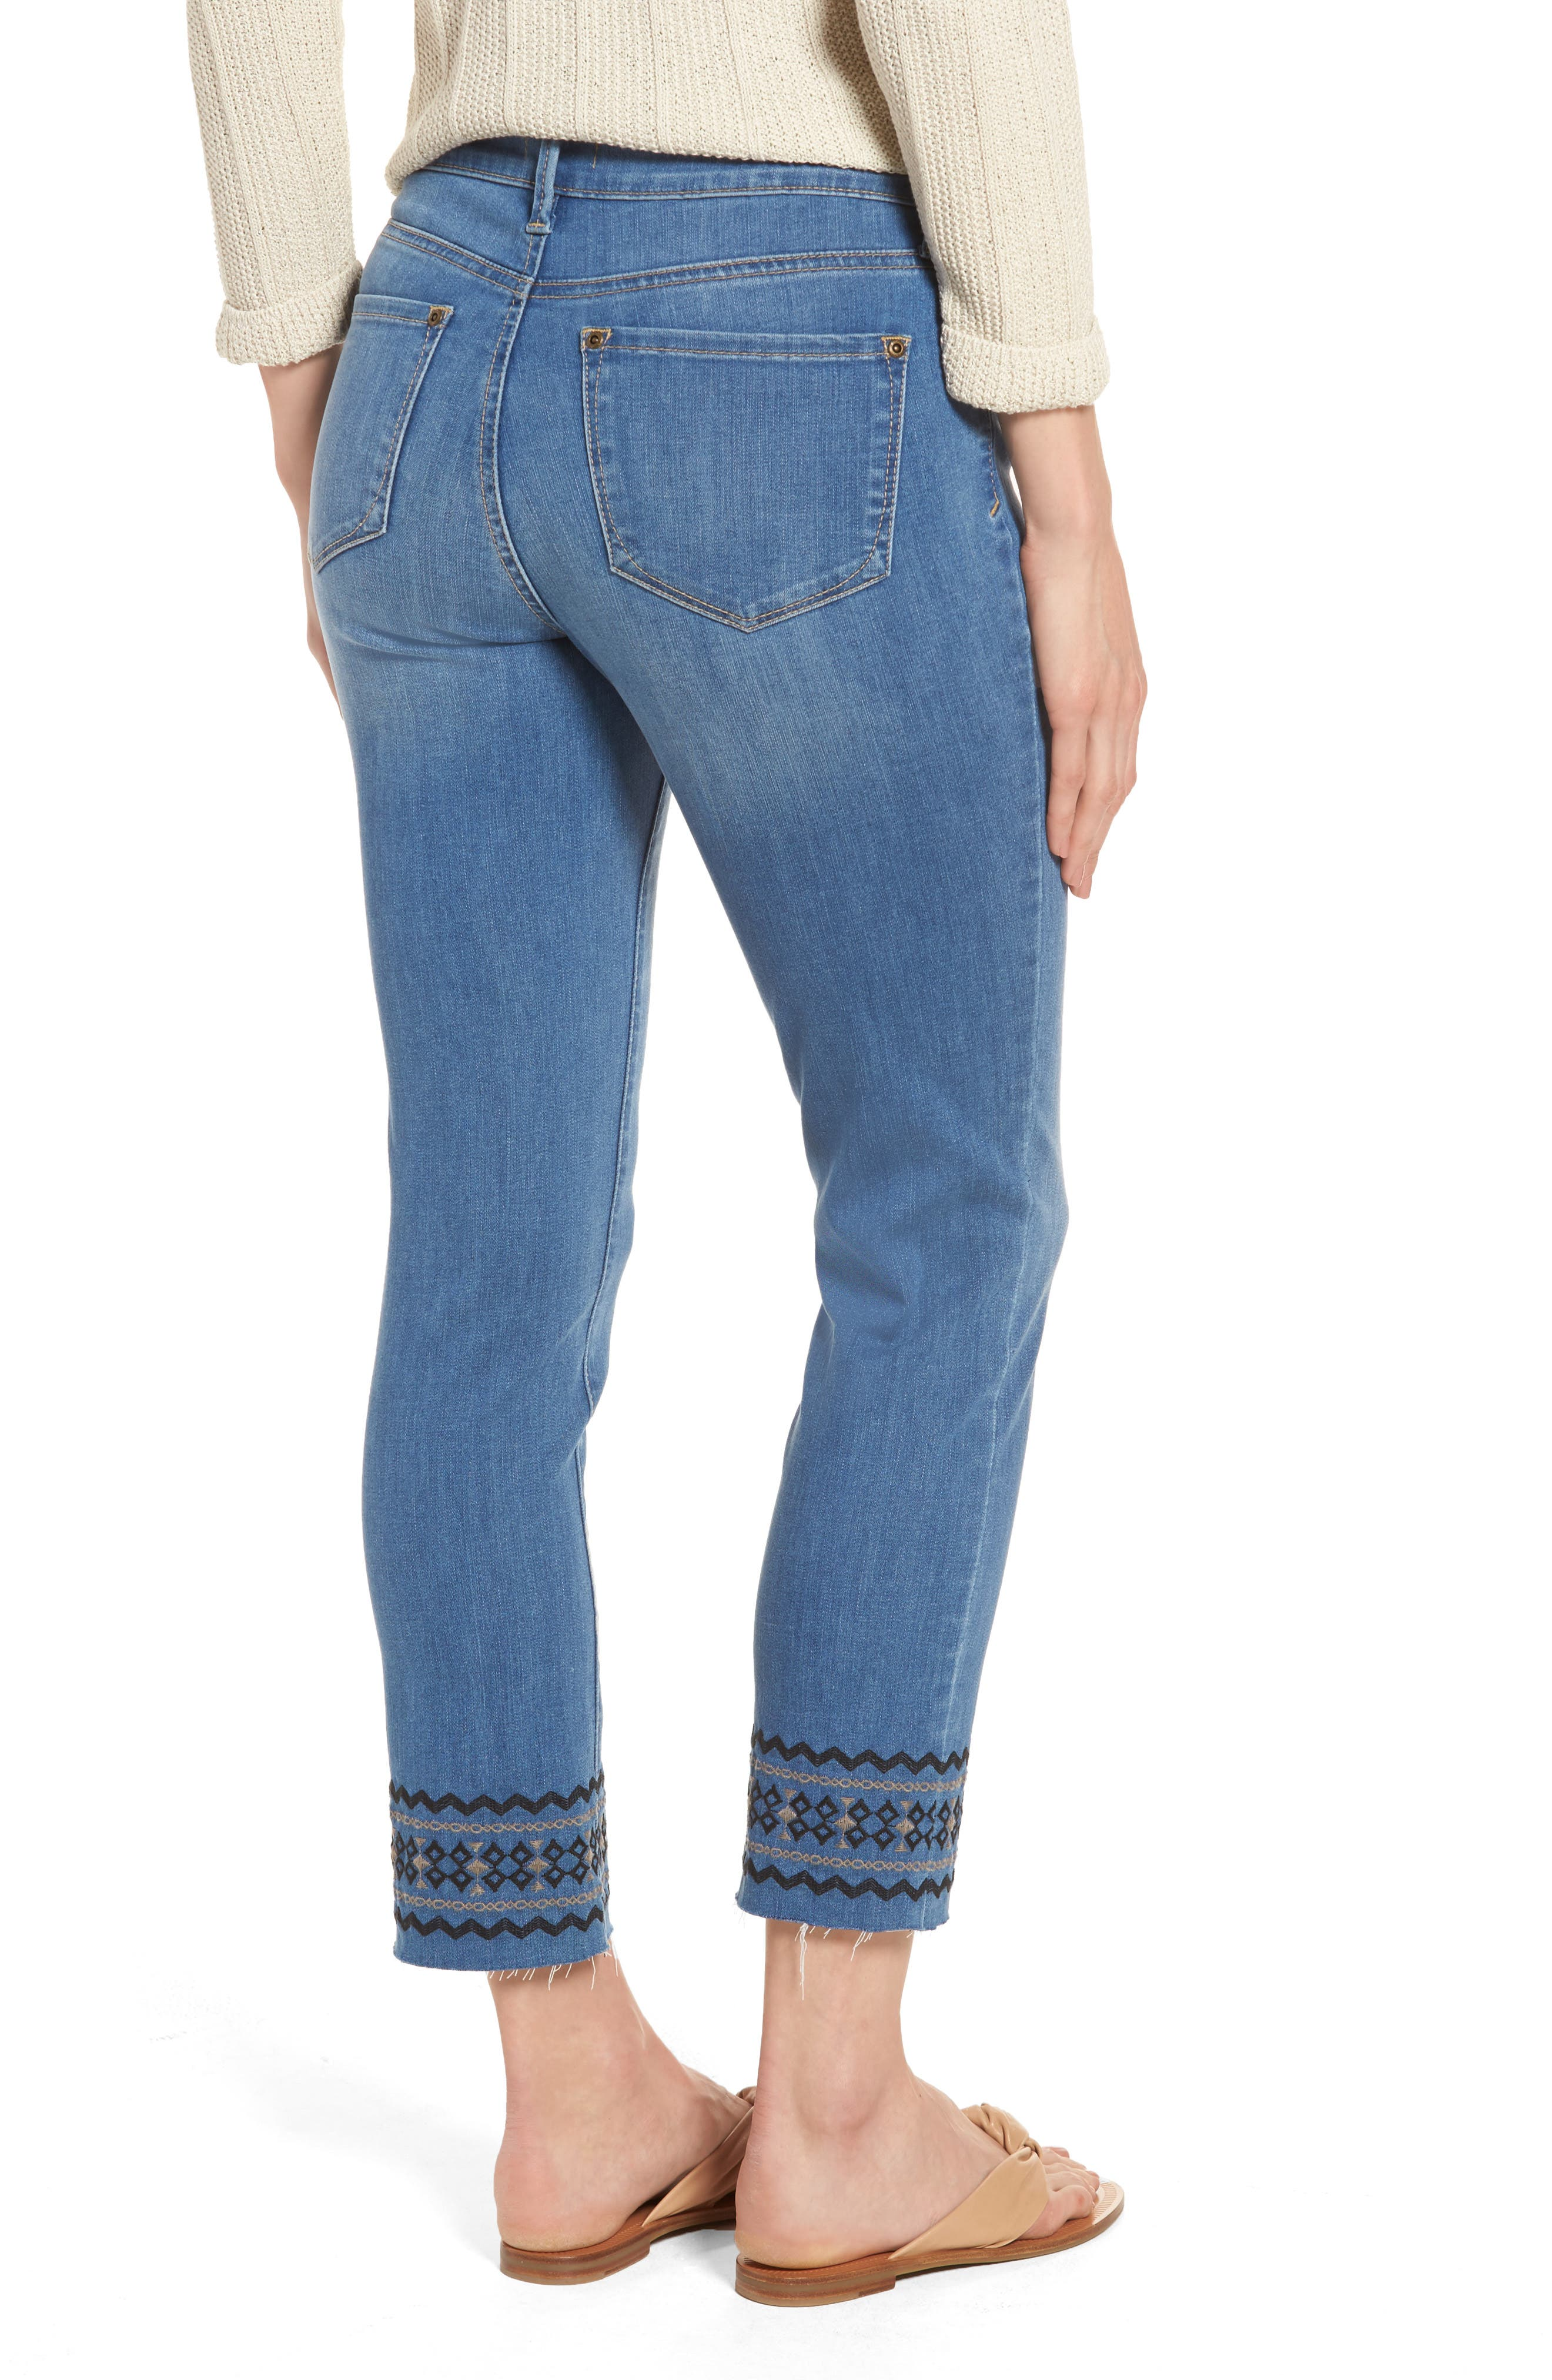 Alternate Image 2  - NYDJ Sheri Embroidered Stretch Slim Crop Jeans (Evansdale)